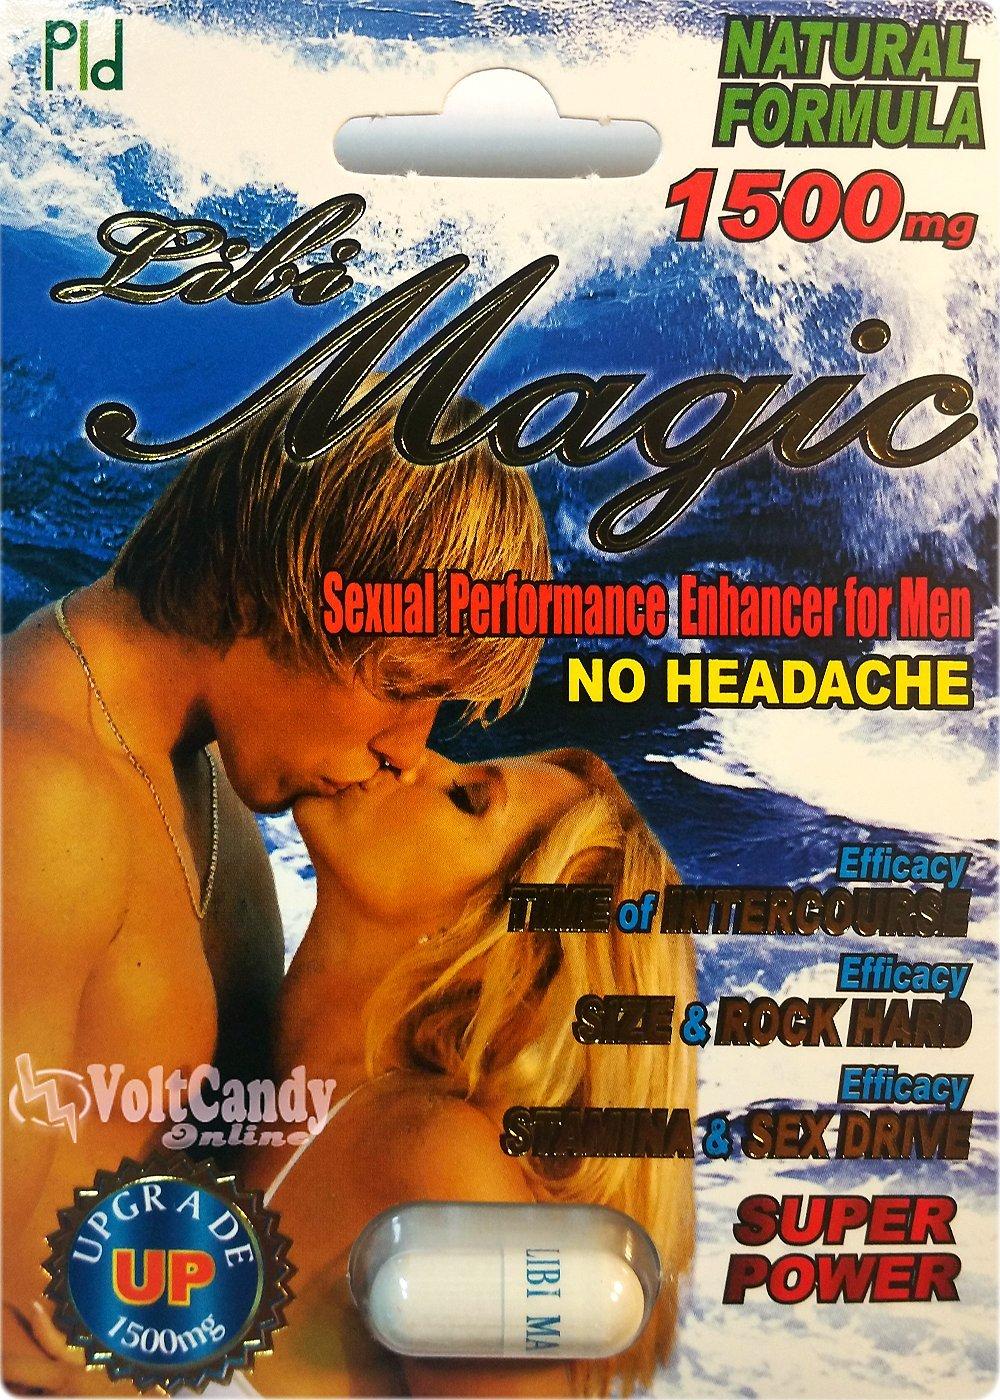 Libi Magic 1500mg Sexual Enhancer for Men Max Powerzen Libido X6